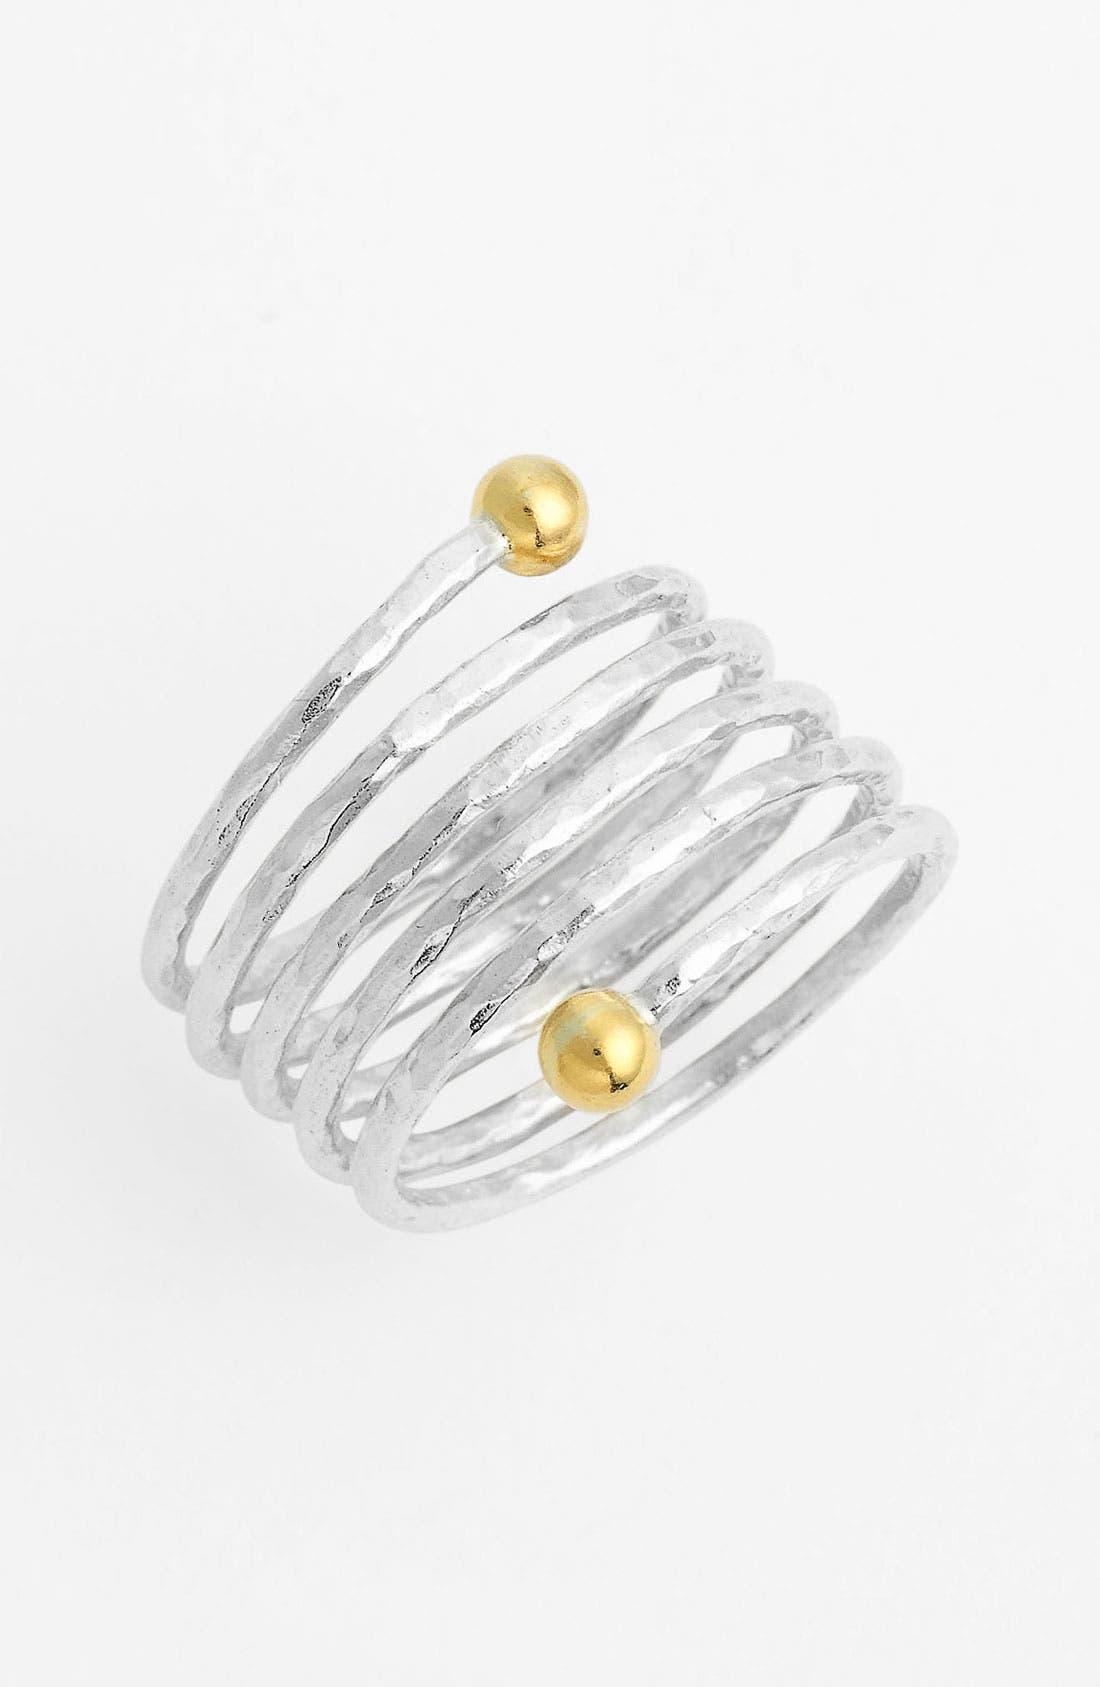 Main Image - Gurhan 'Spring' Coil Ring